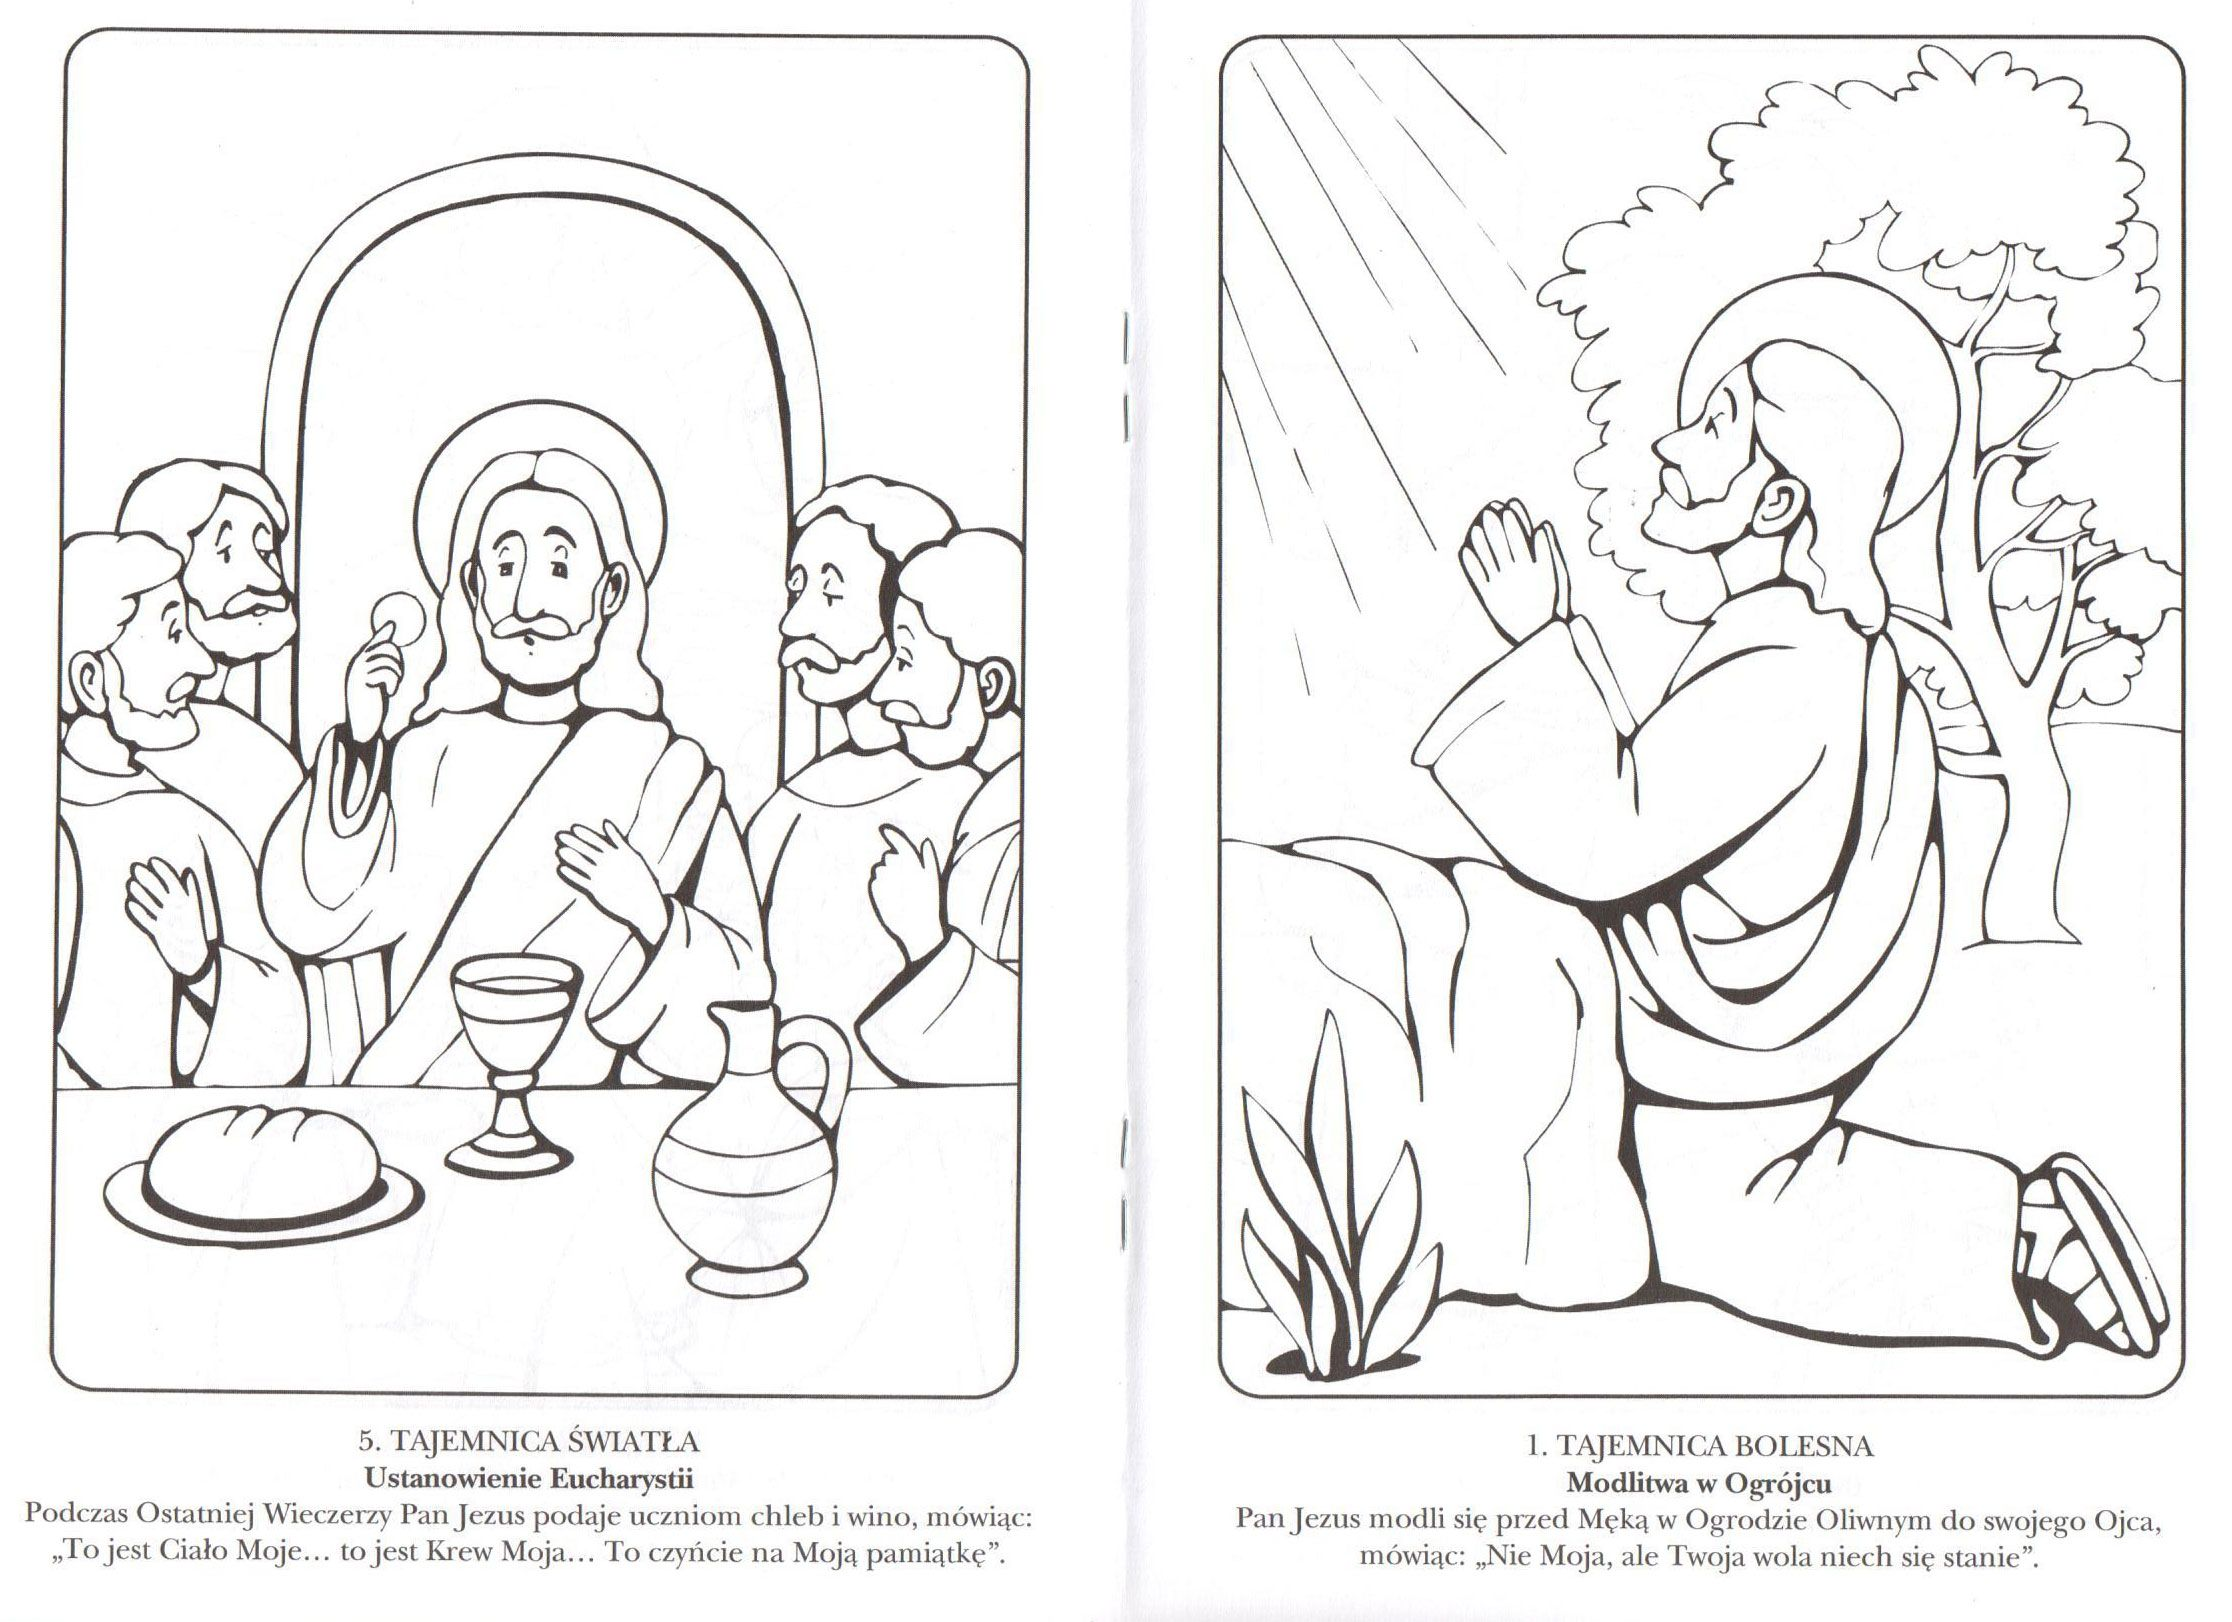 Pin By Diane Bustilo On Cuaresma Y Semana Santa Art Humanoid Sketch